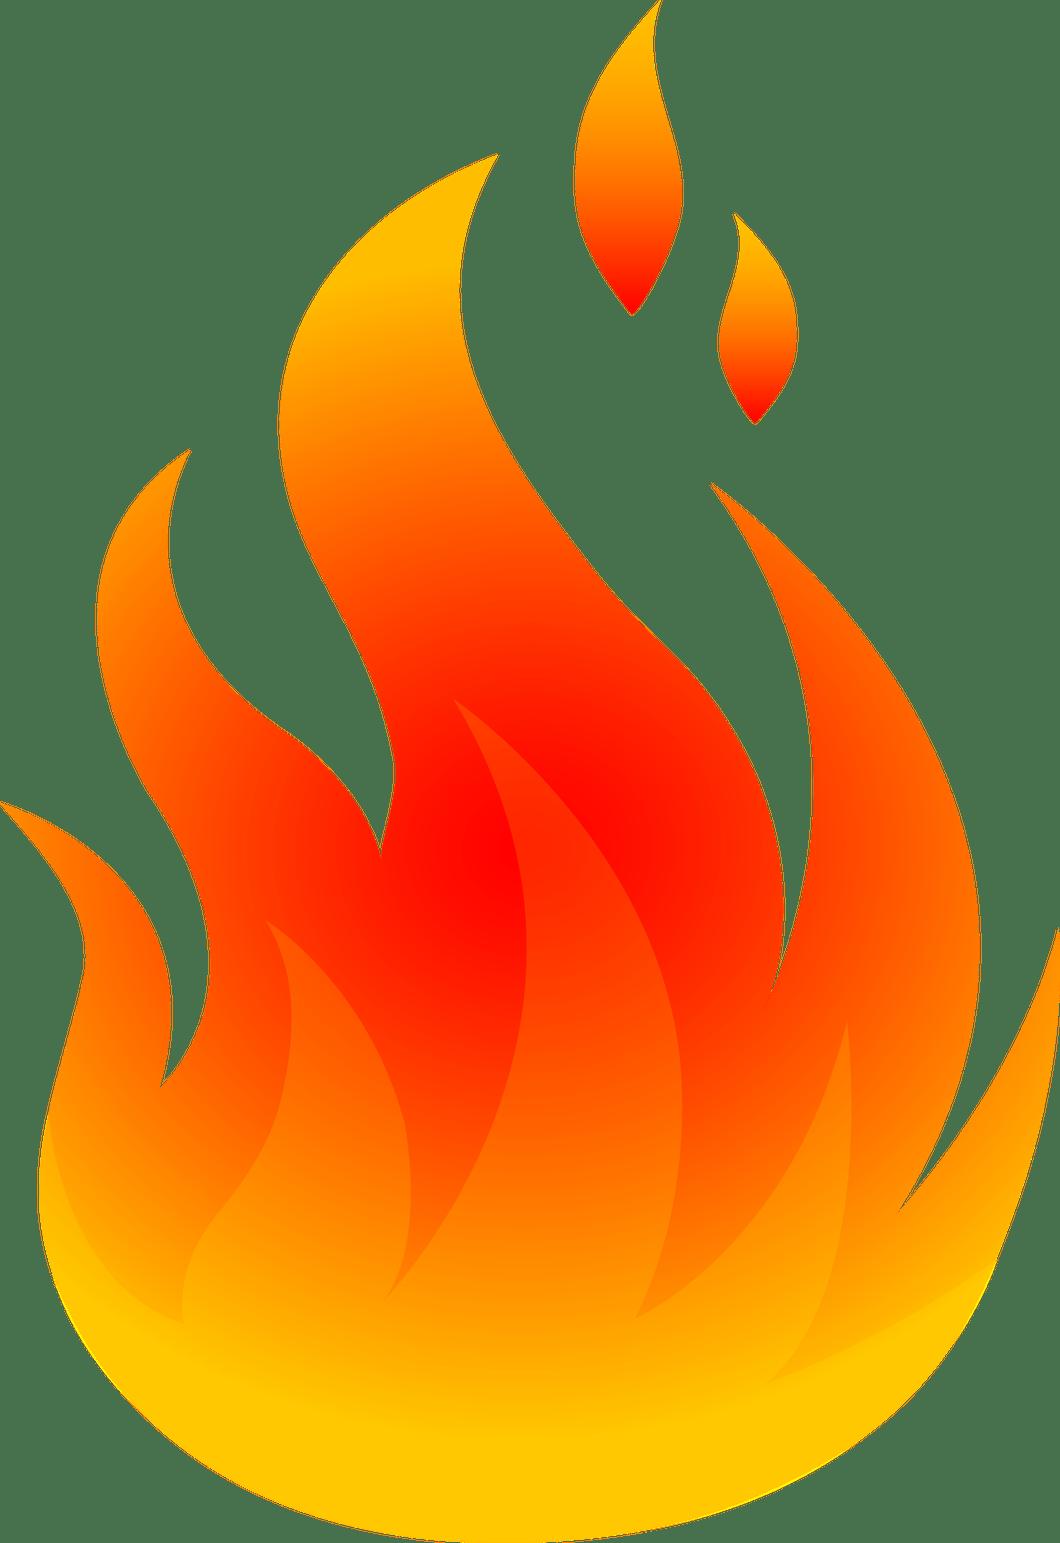 Wheel clipart flaming. Flame cartoon cliparts free